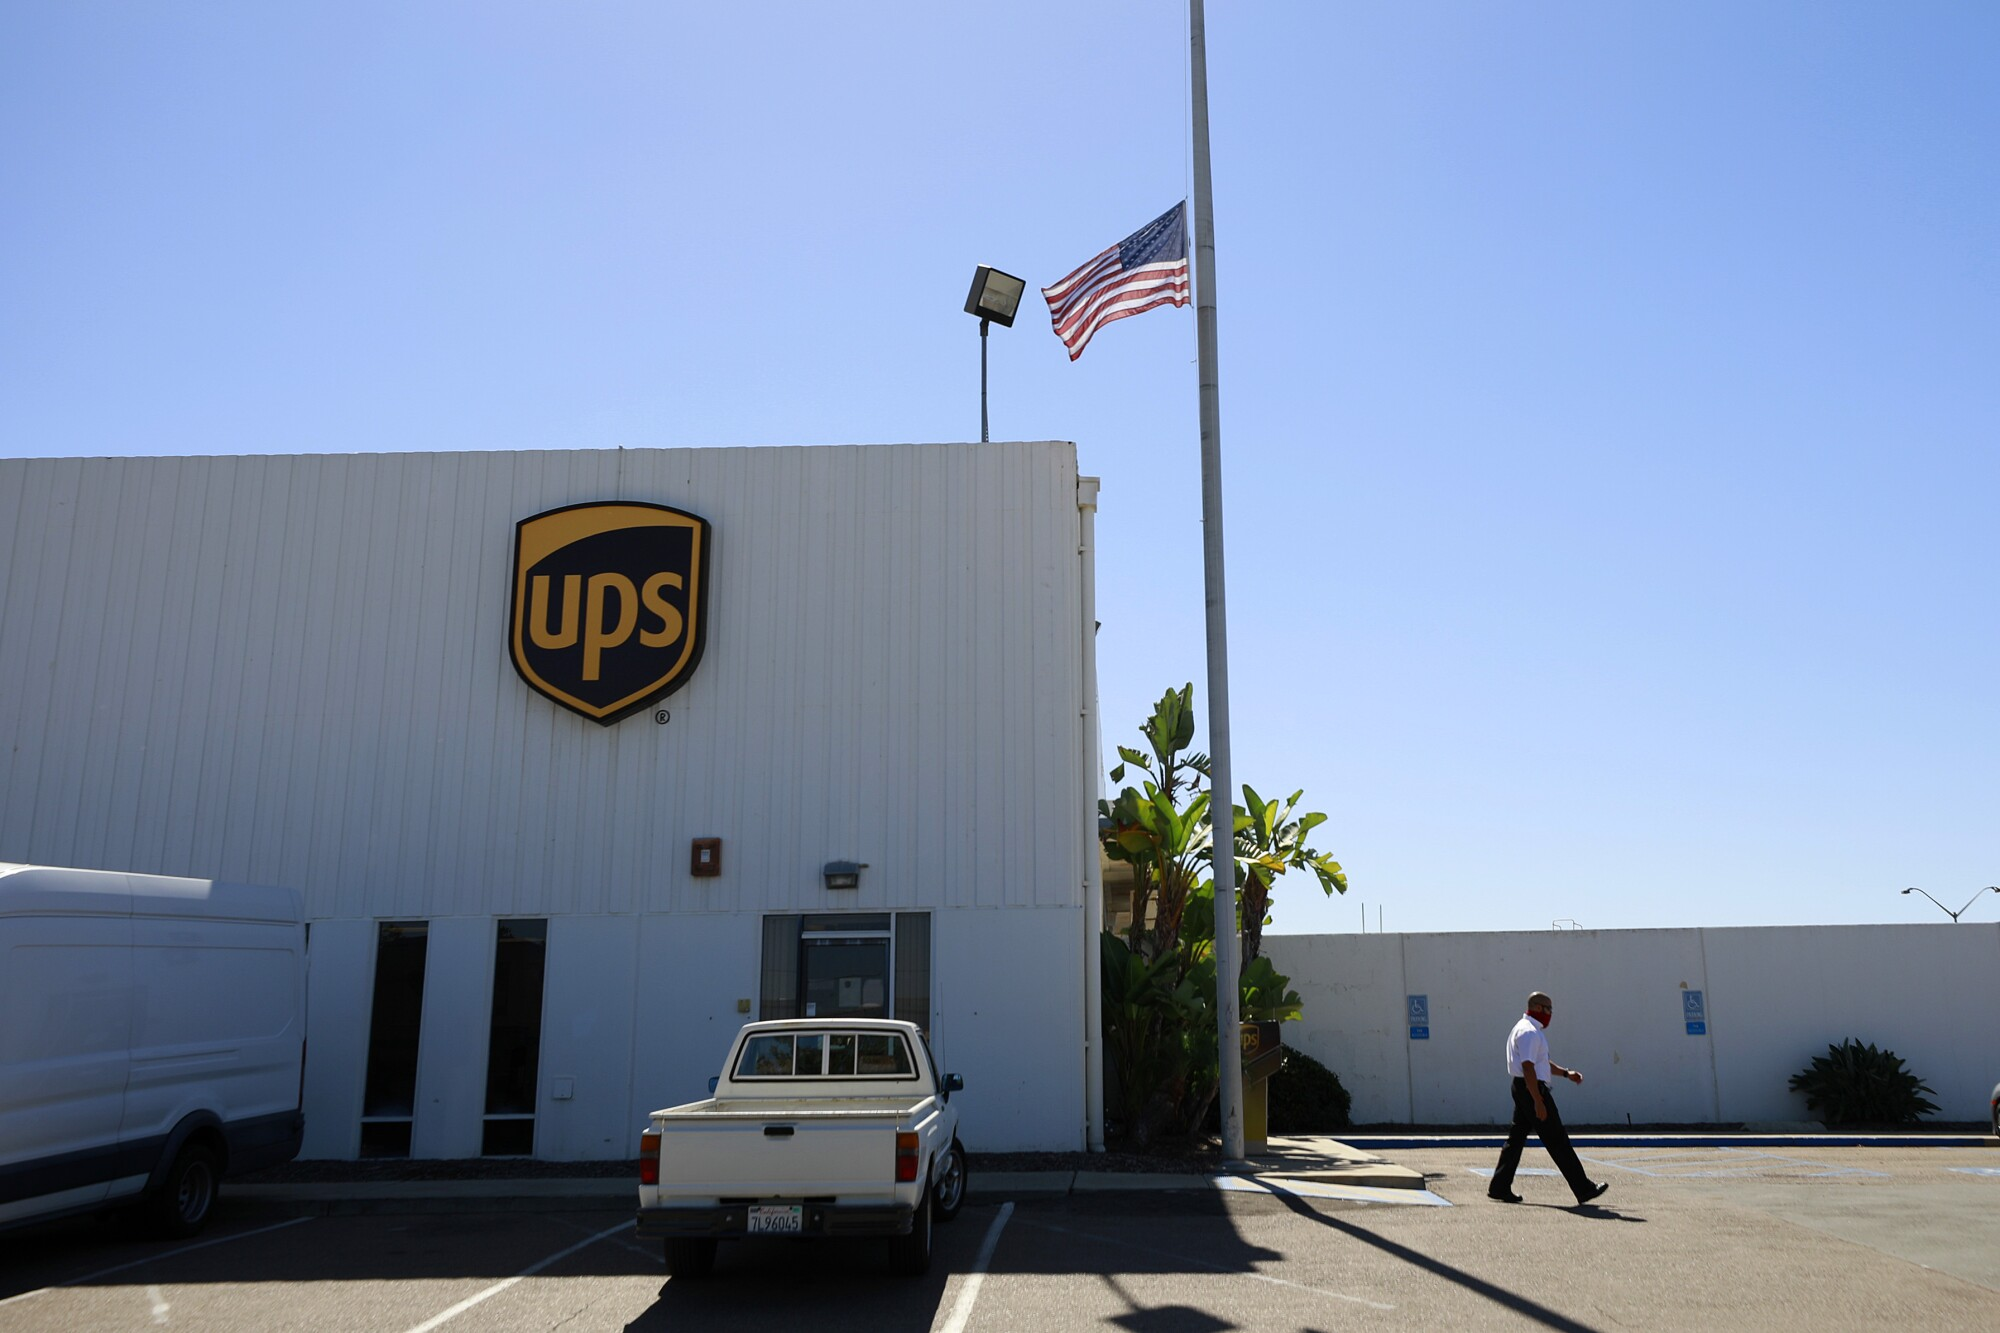 Flags flew at half mast at the UPS facility in Kearney Mesa to honor of UPS driver Steve Krueger.